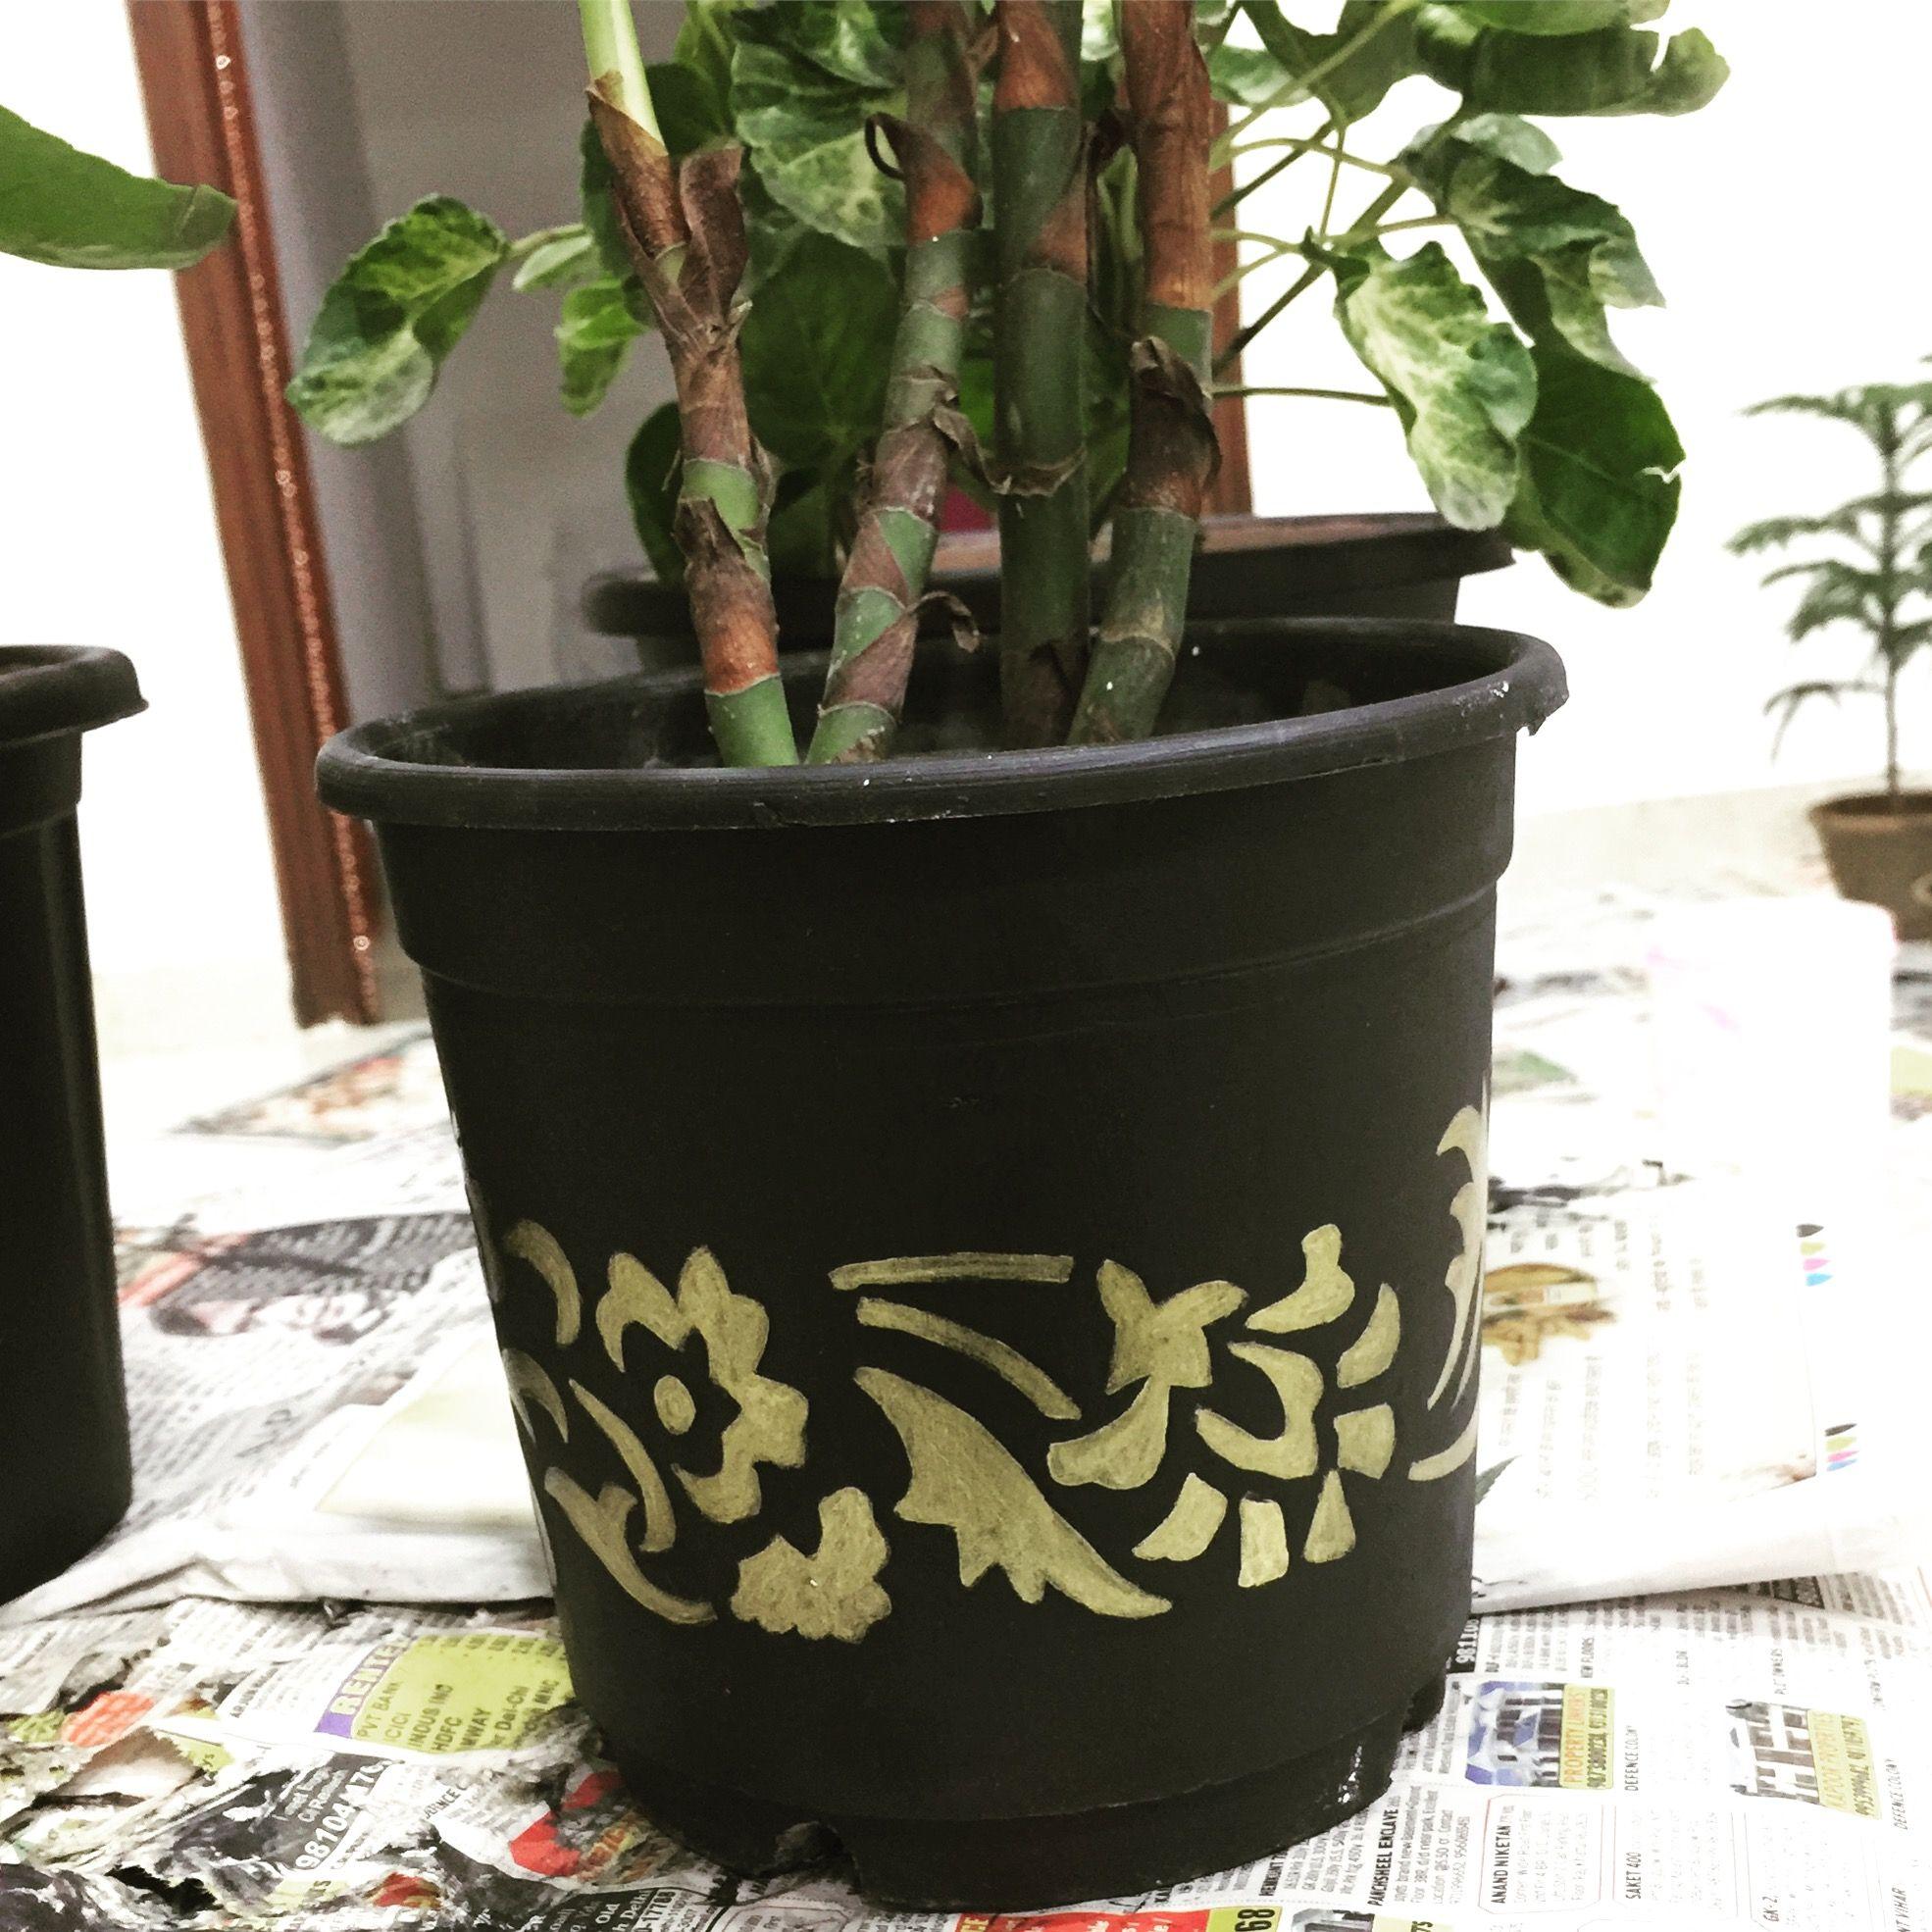 Self painted flower pot for sale. artwork art artist